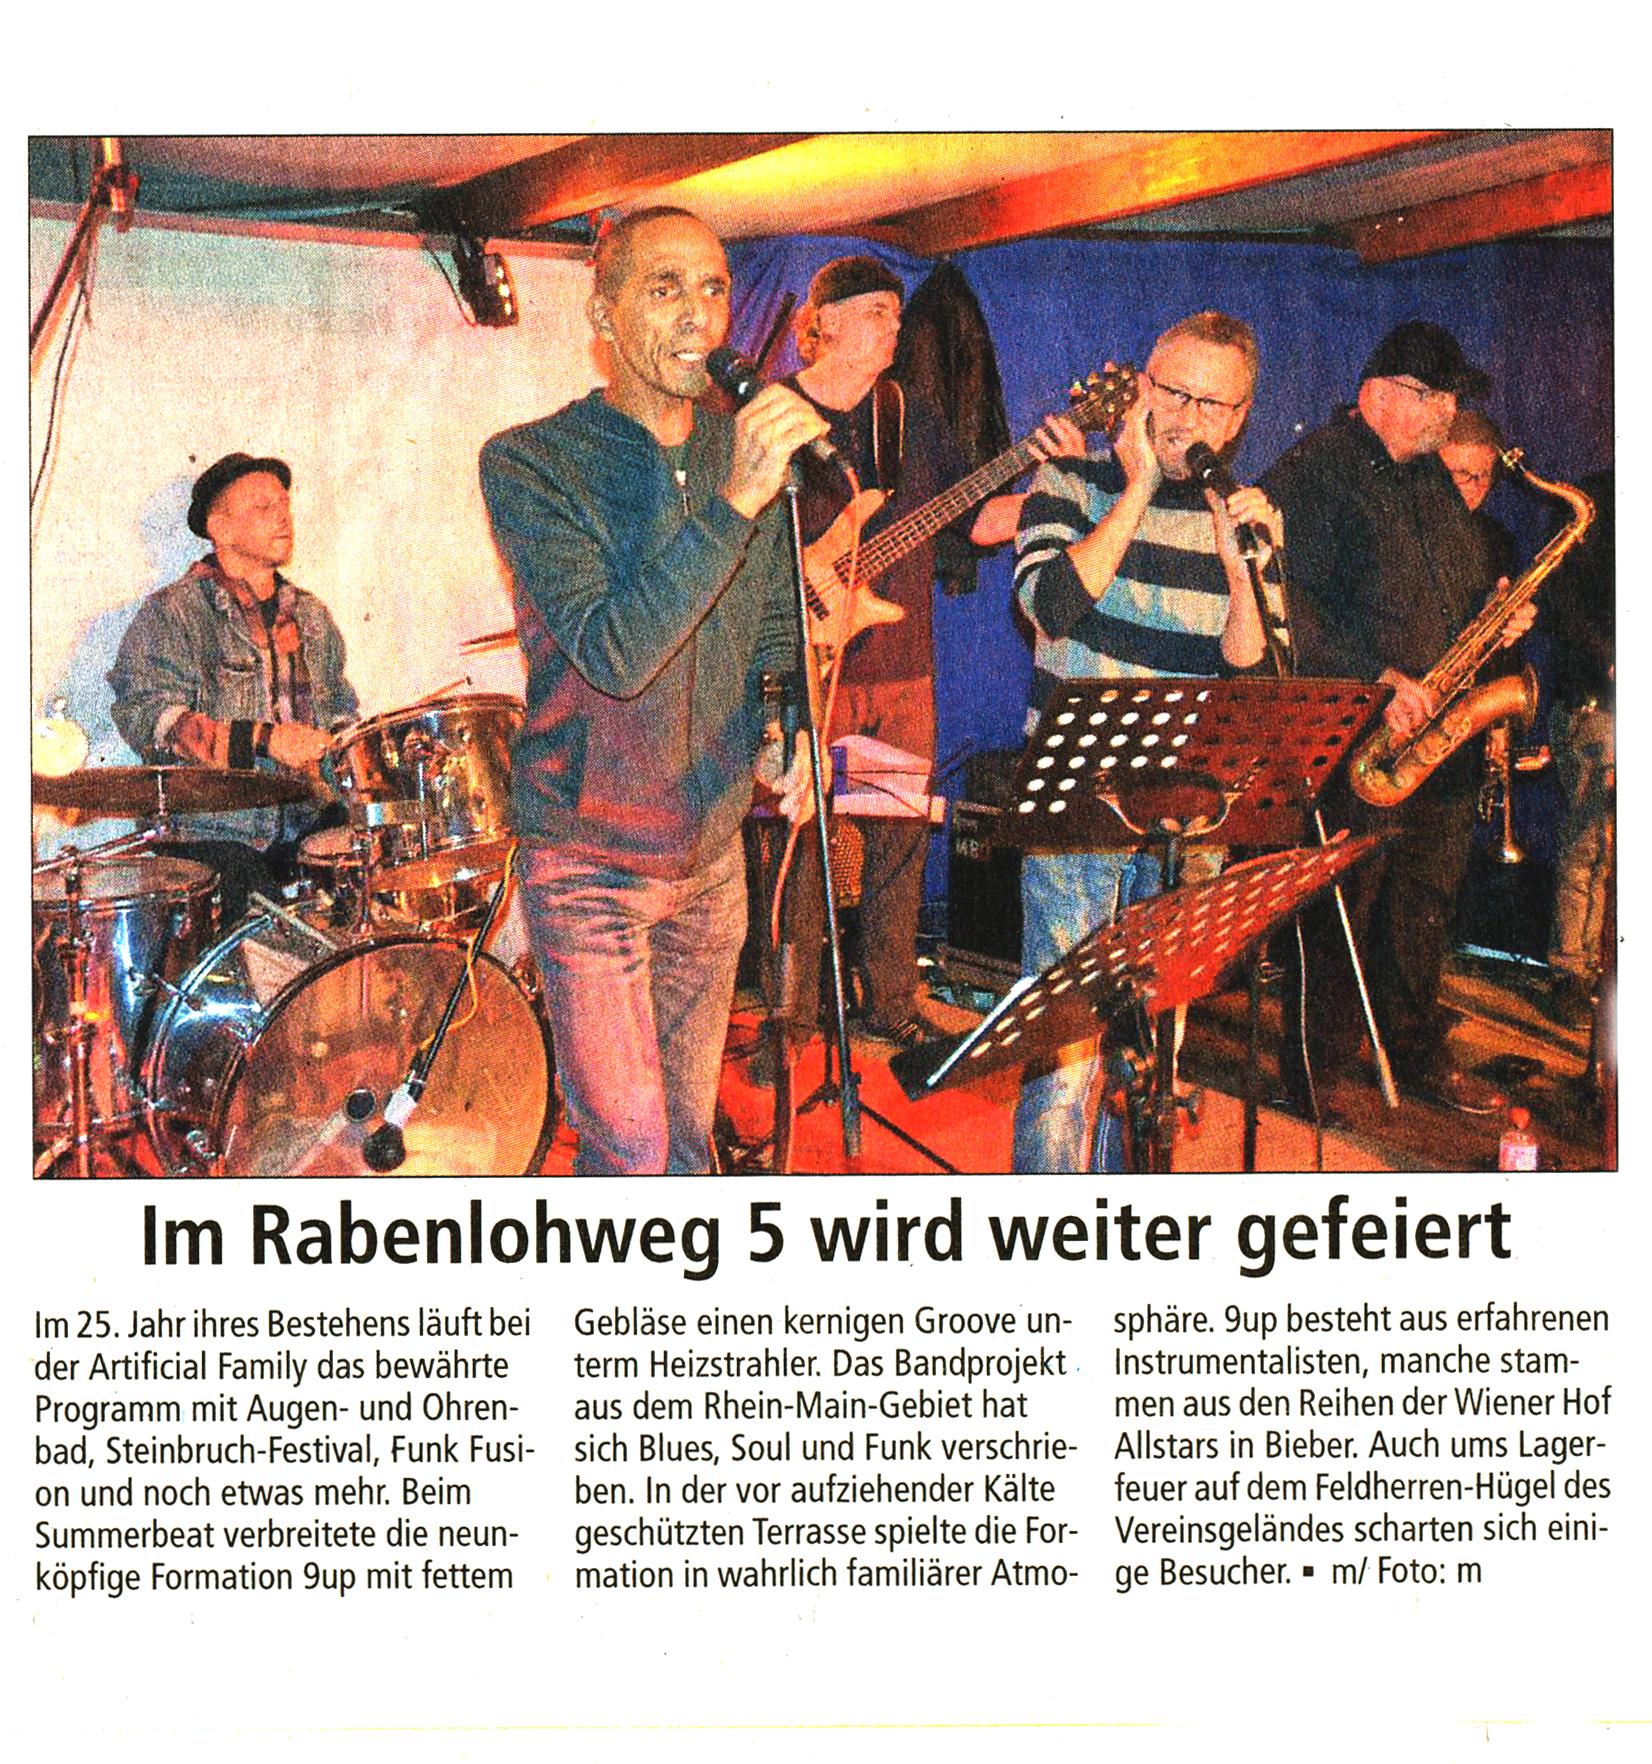 Offenbach Post, 13. Oktober 2017